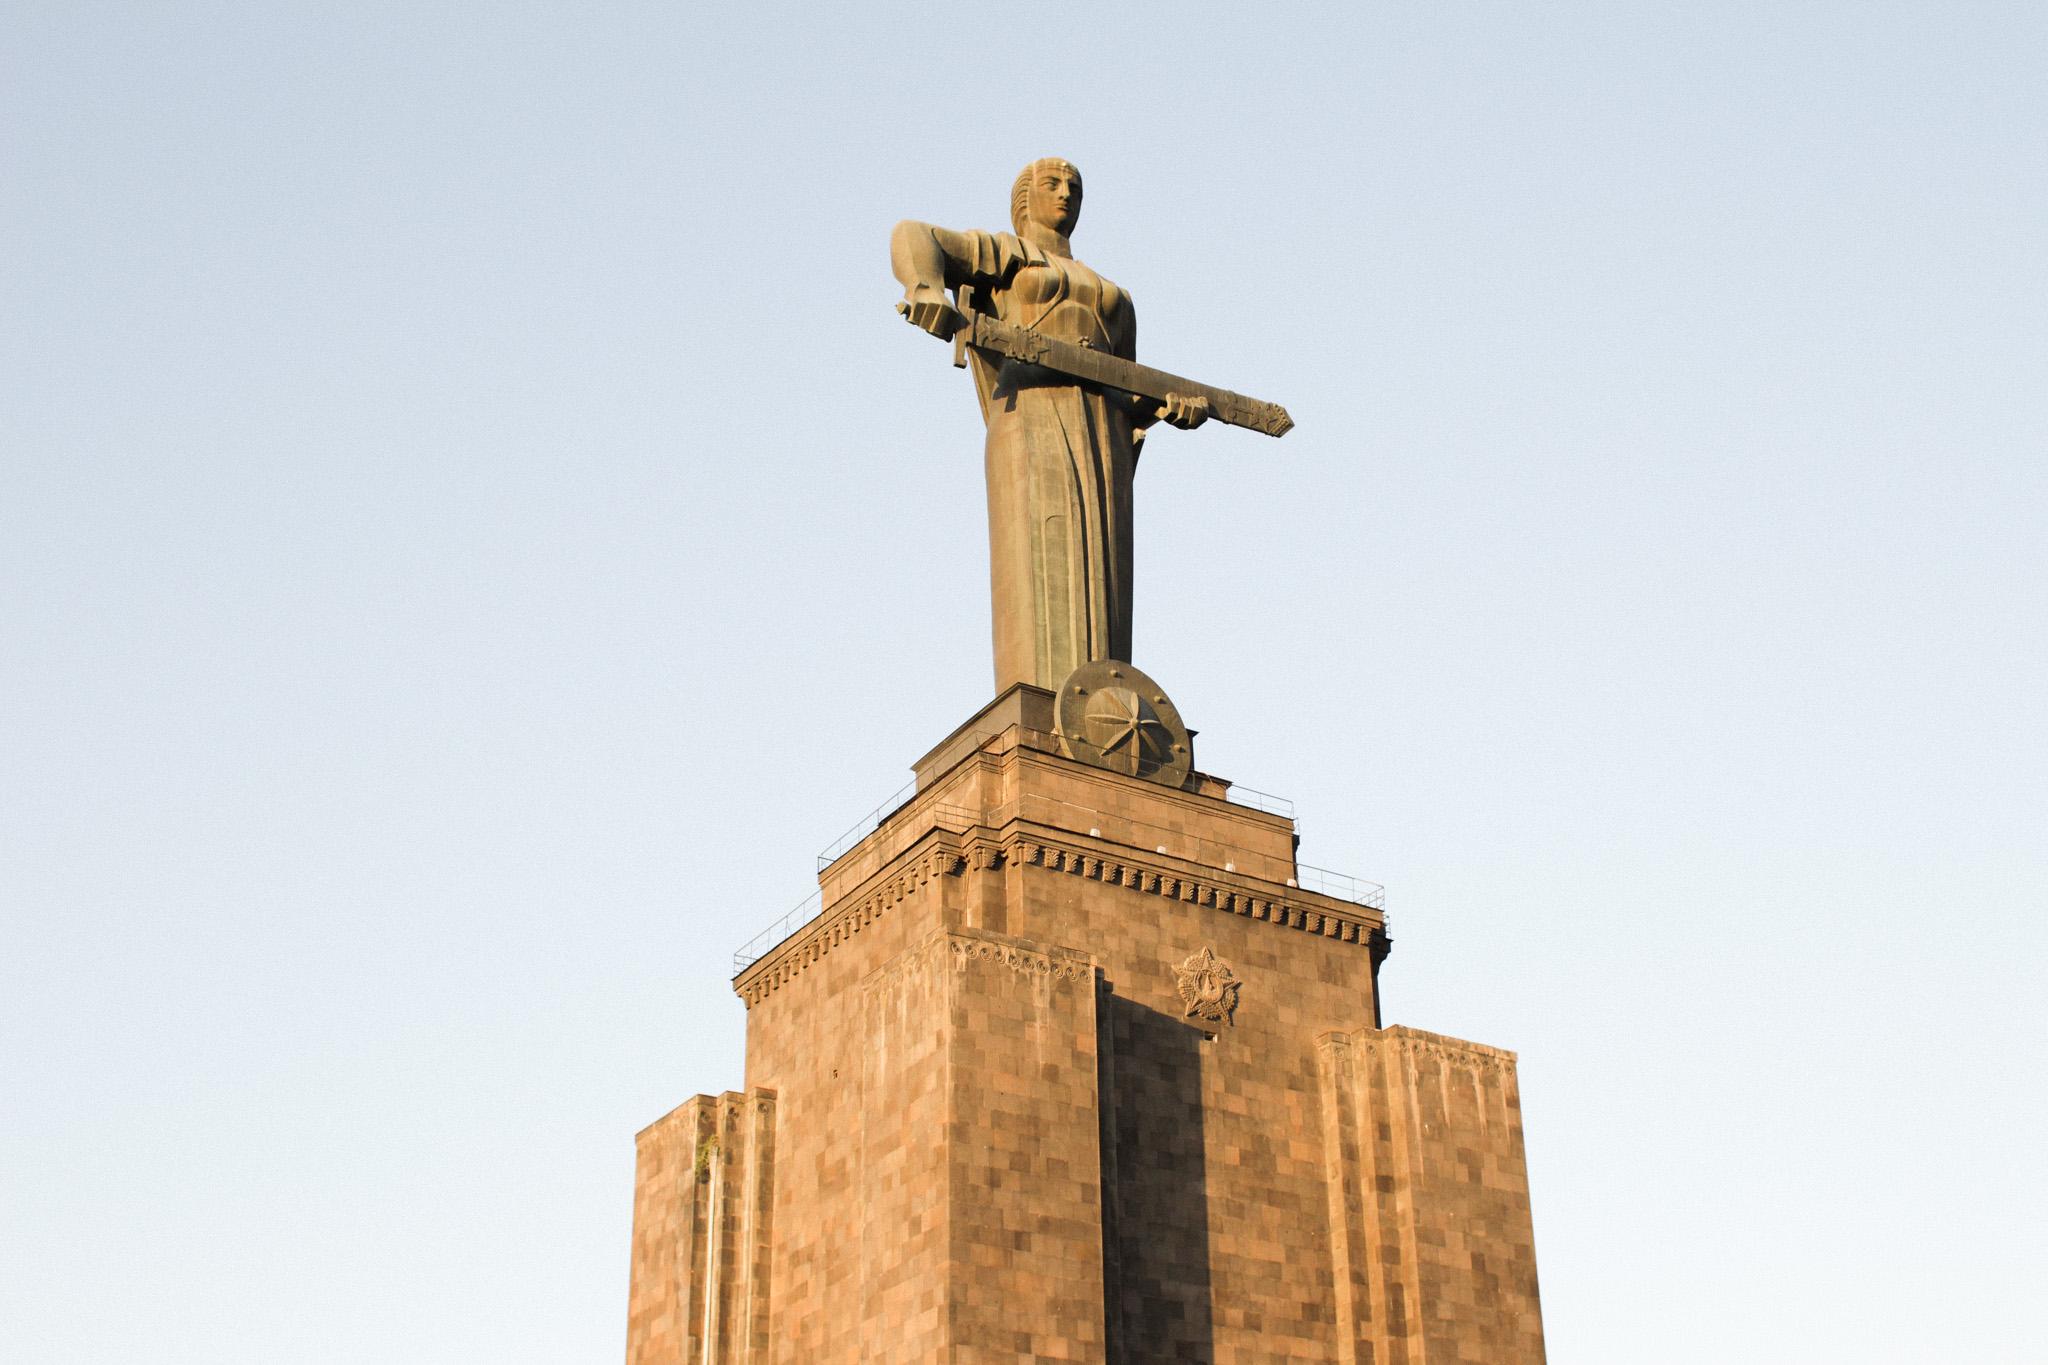 yerevan-armenia-rfm-portfolio-13.jpg